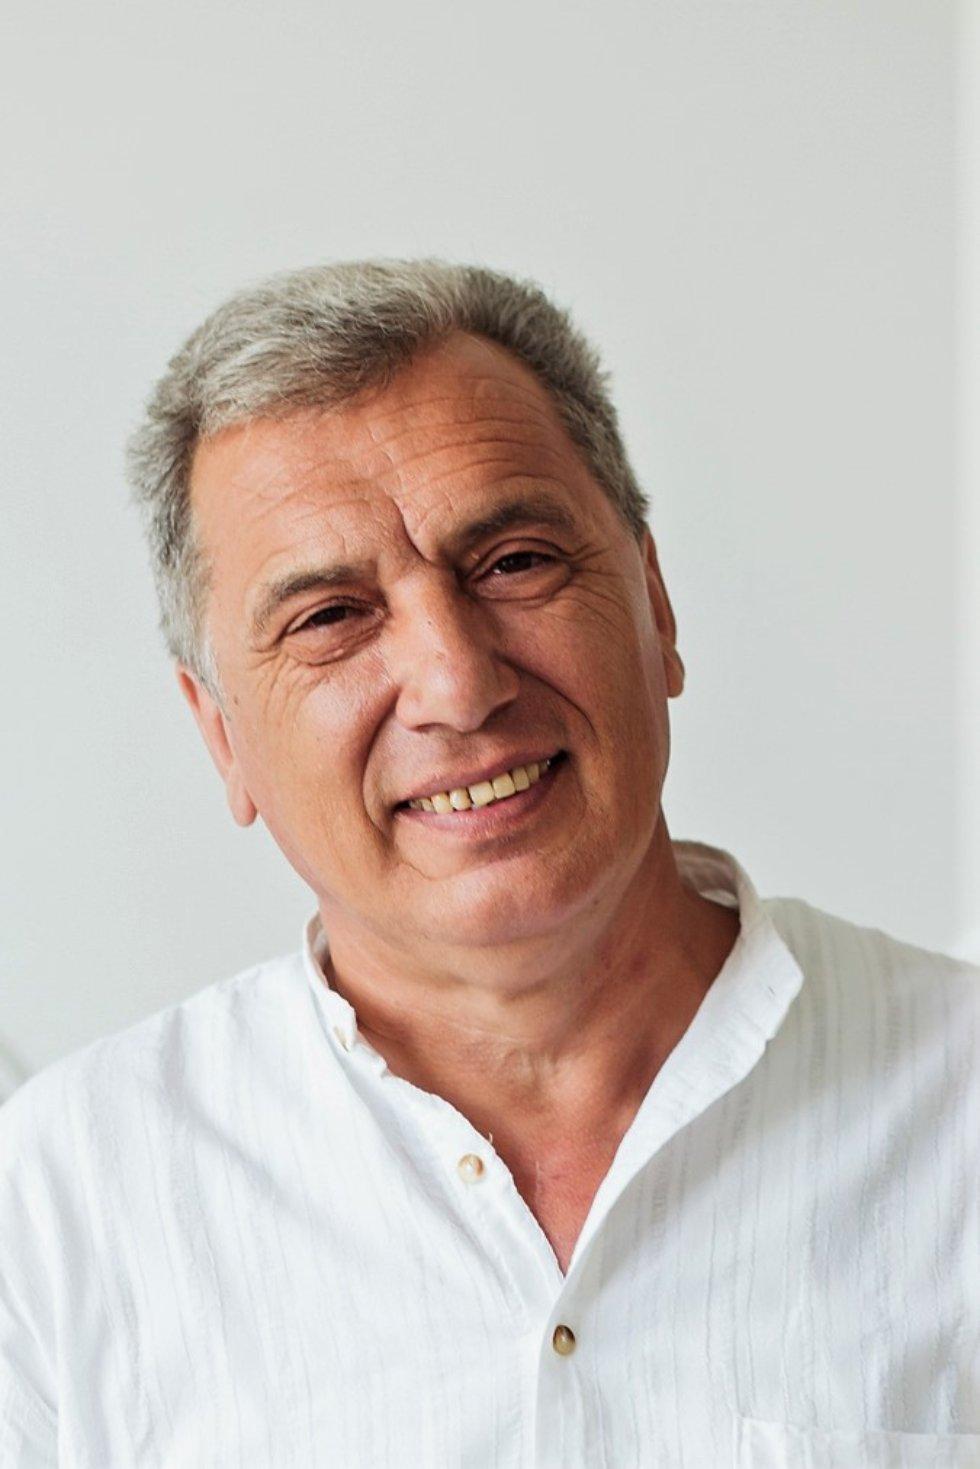 Бухараев Наиль Раисович